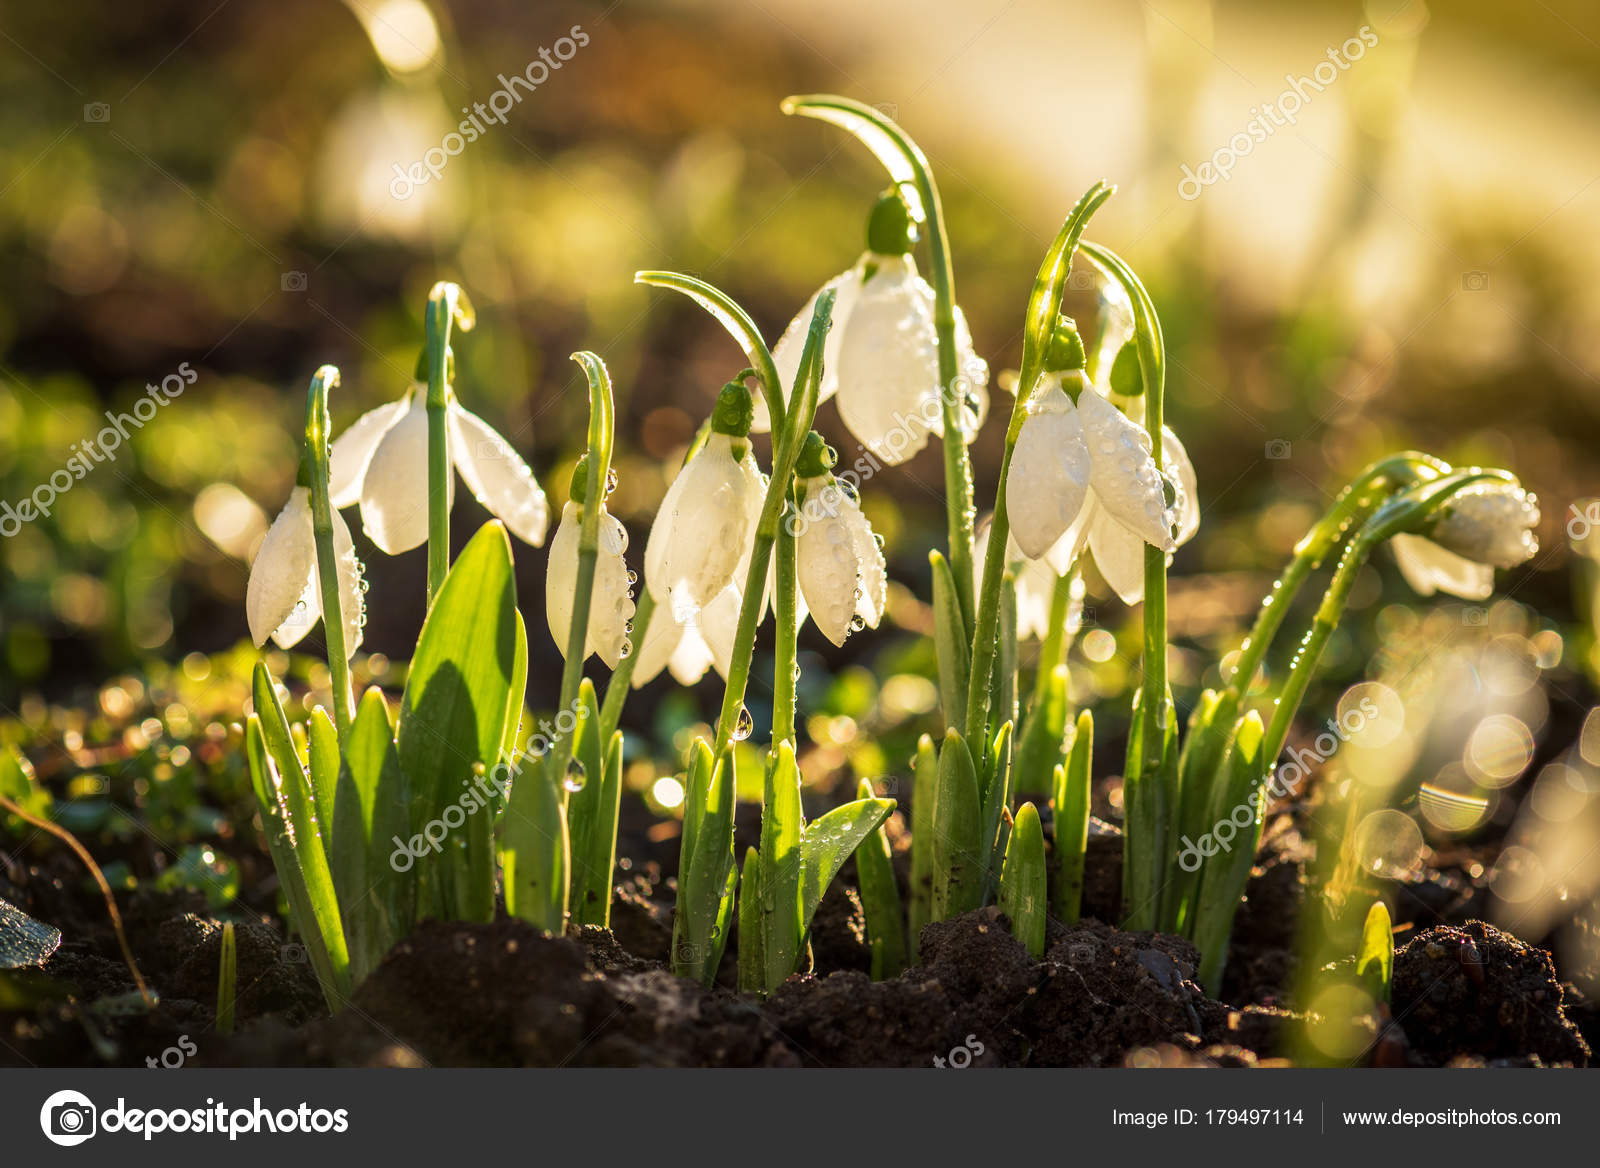 Erste Fruhlingsblumen Schneeglockchen Stockfoto C Ba1istic 179497114